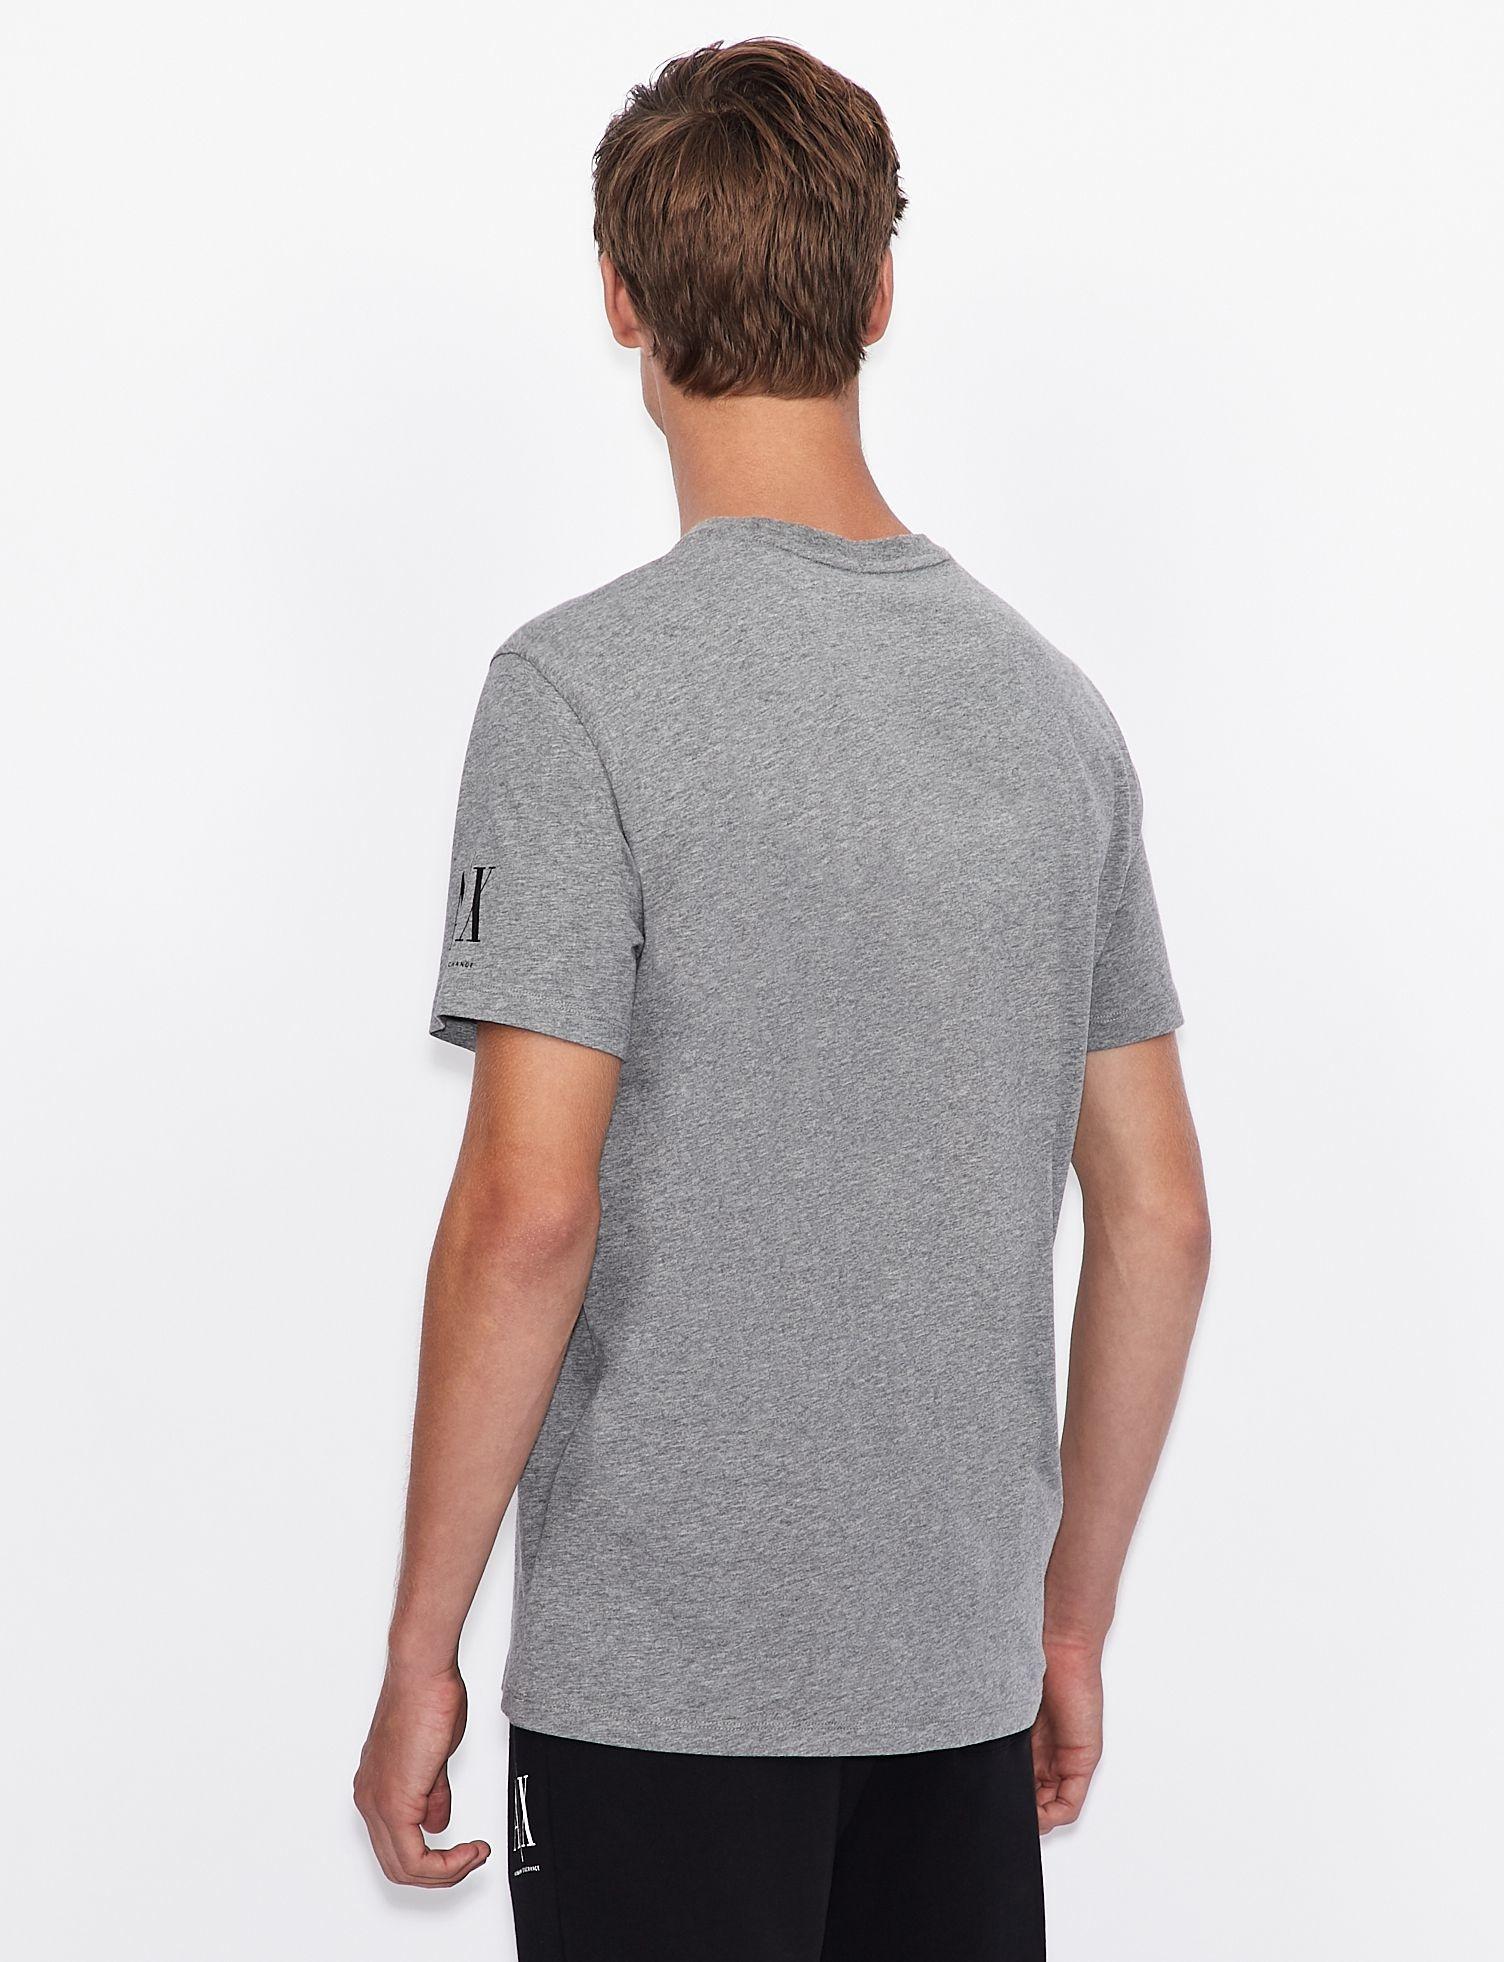 Armani Exchange T-shirt Armani Exchange 6HZTJF-ZJHZ4-3987